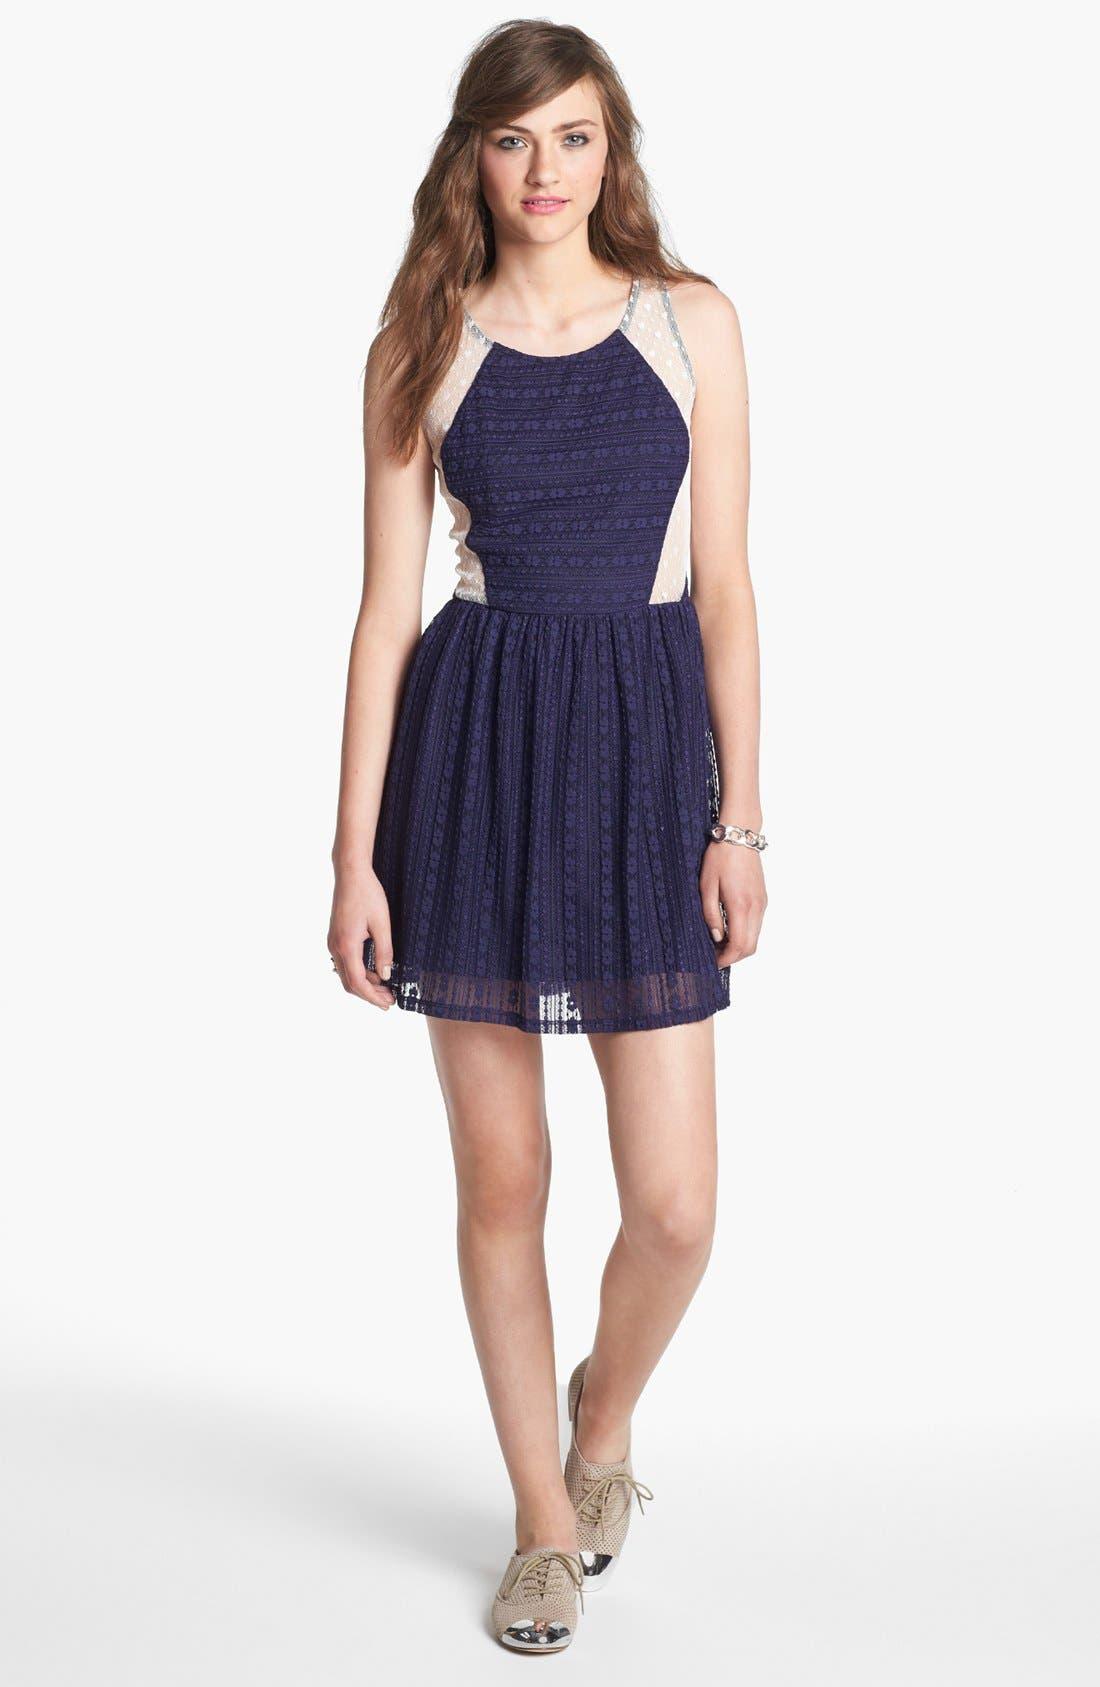 Alternate Image 1 Selected - Robin K Lace Illusion Skater Dress (Juniors)